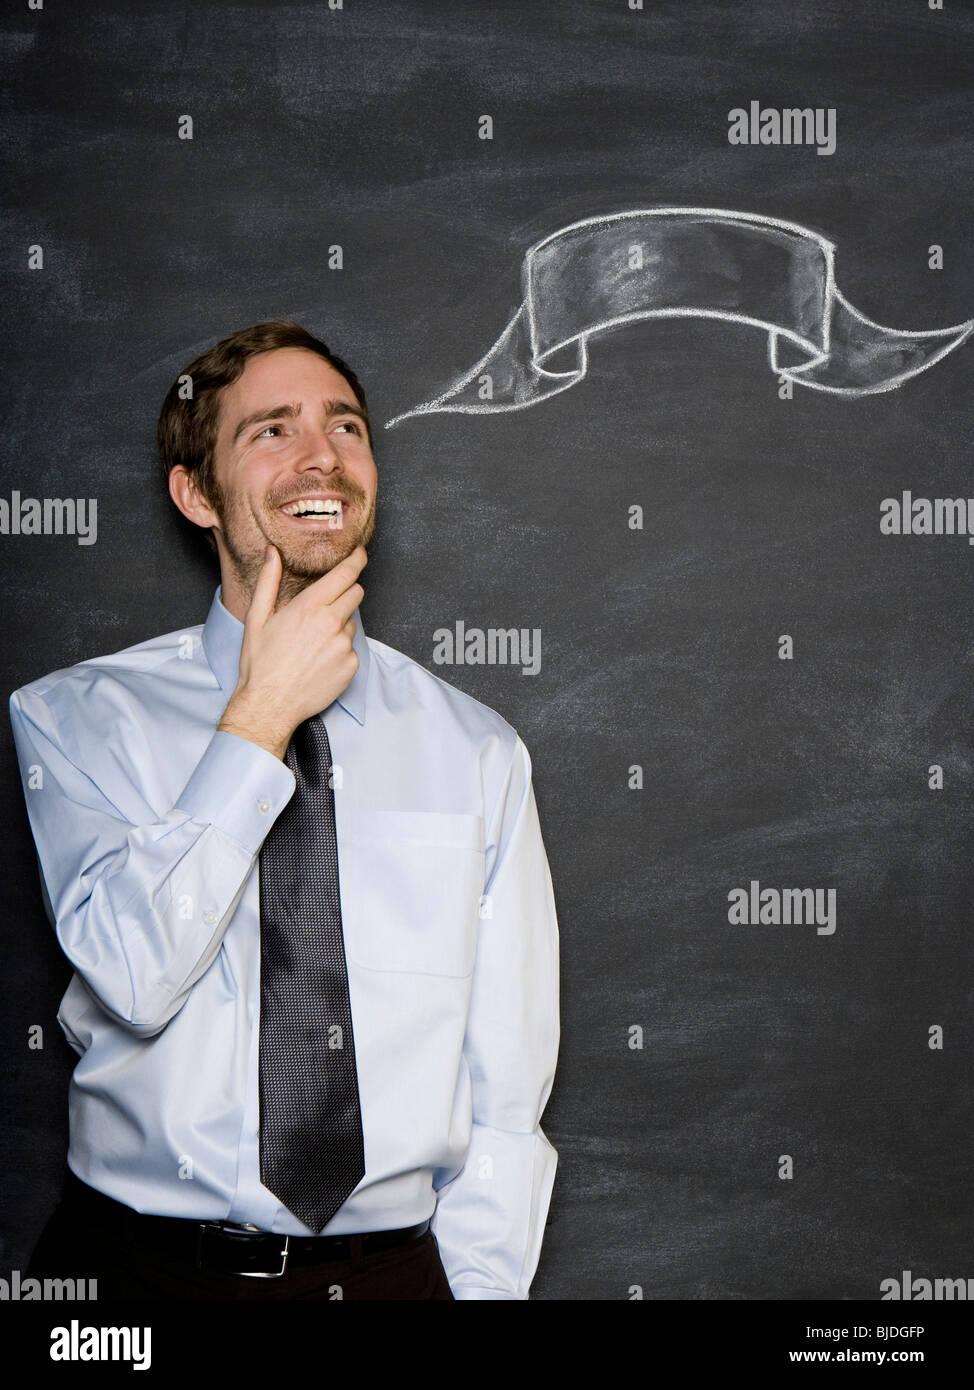 man against a blackboard - Stock Image